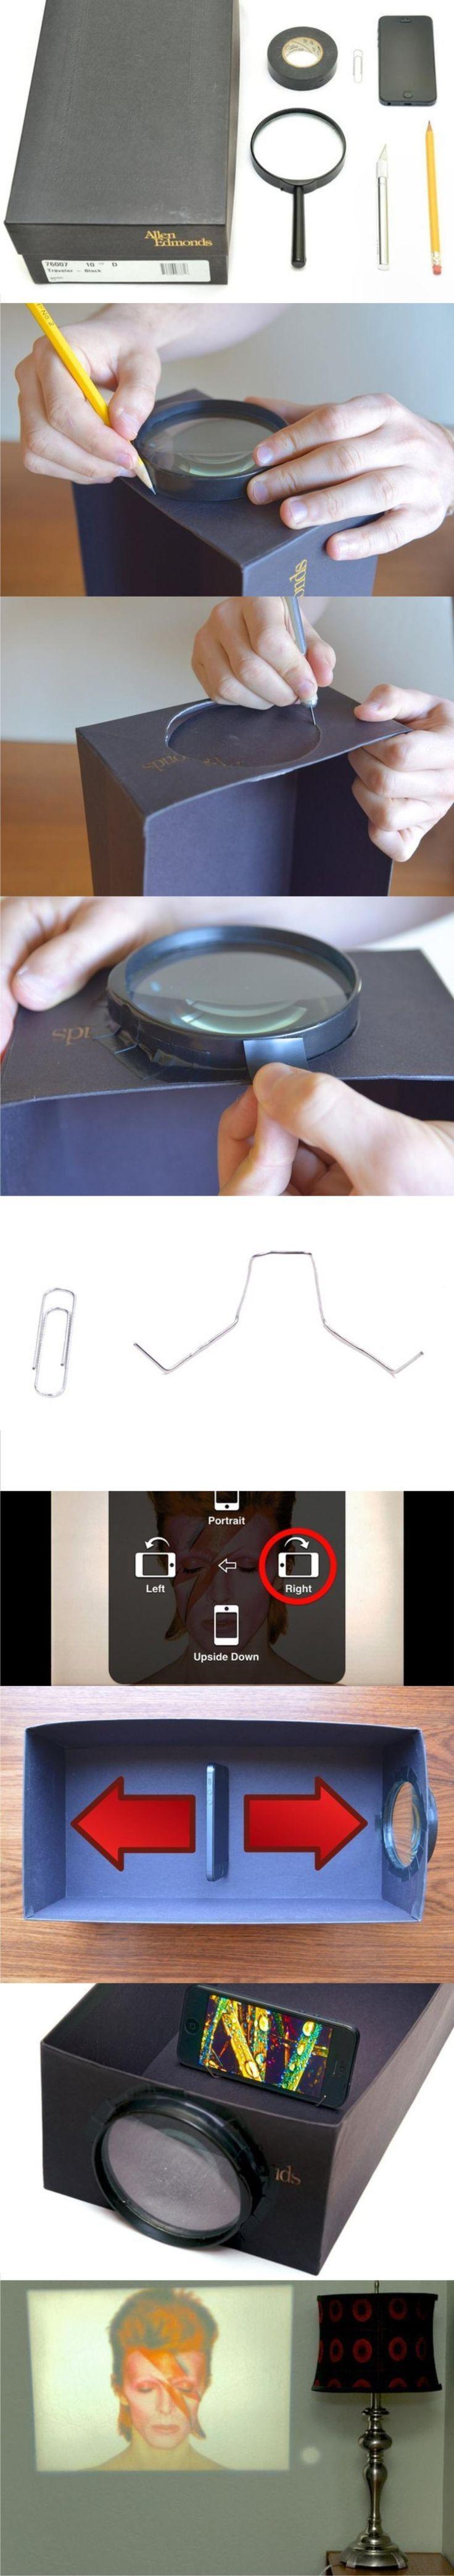 proyector DIY para iphone muy ingenioso